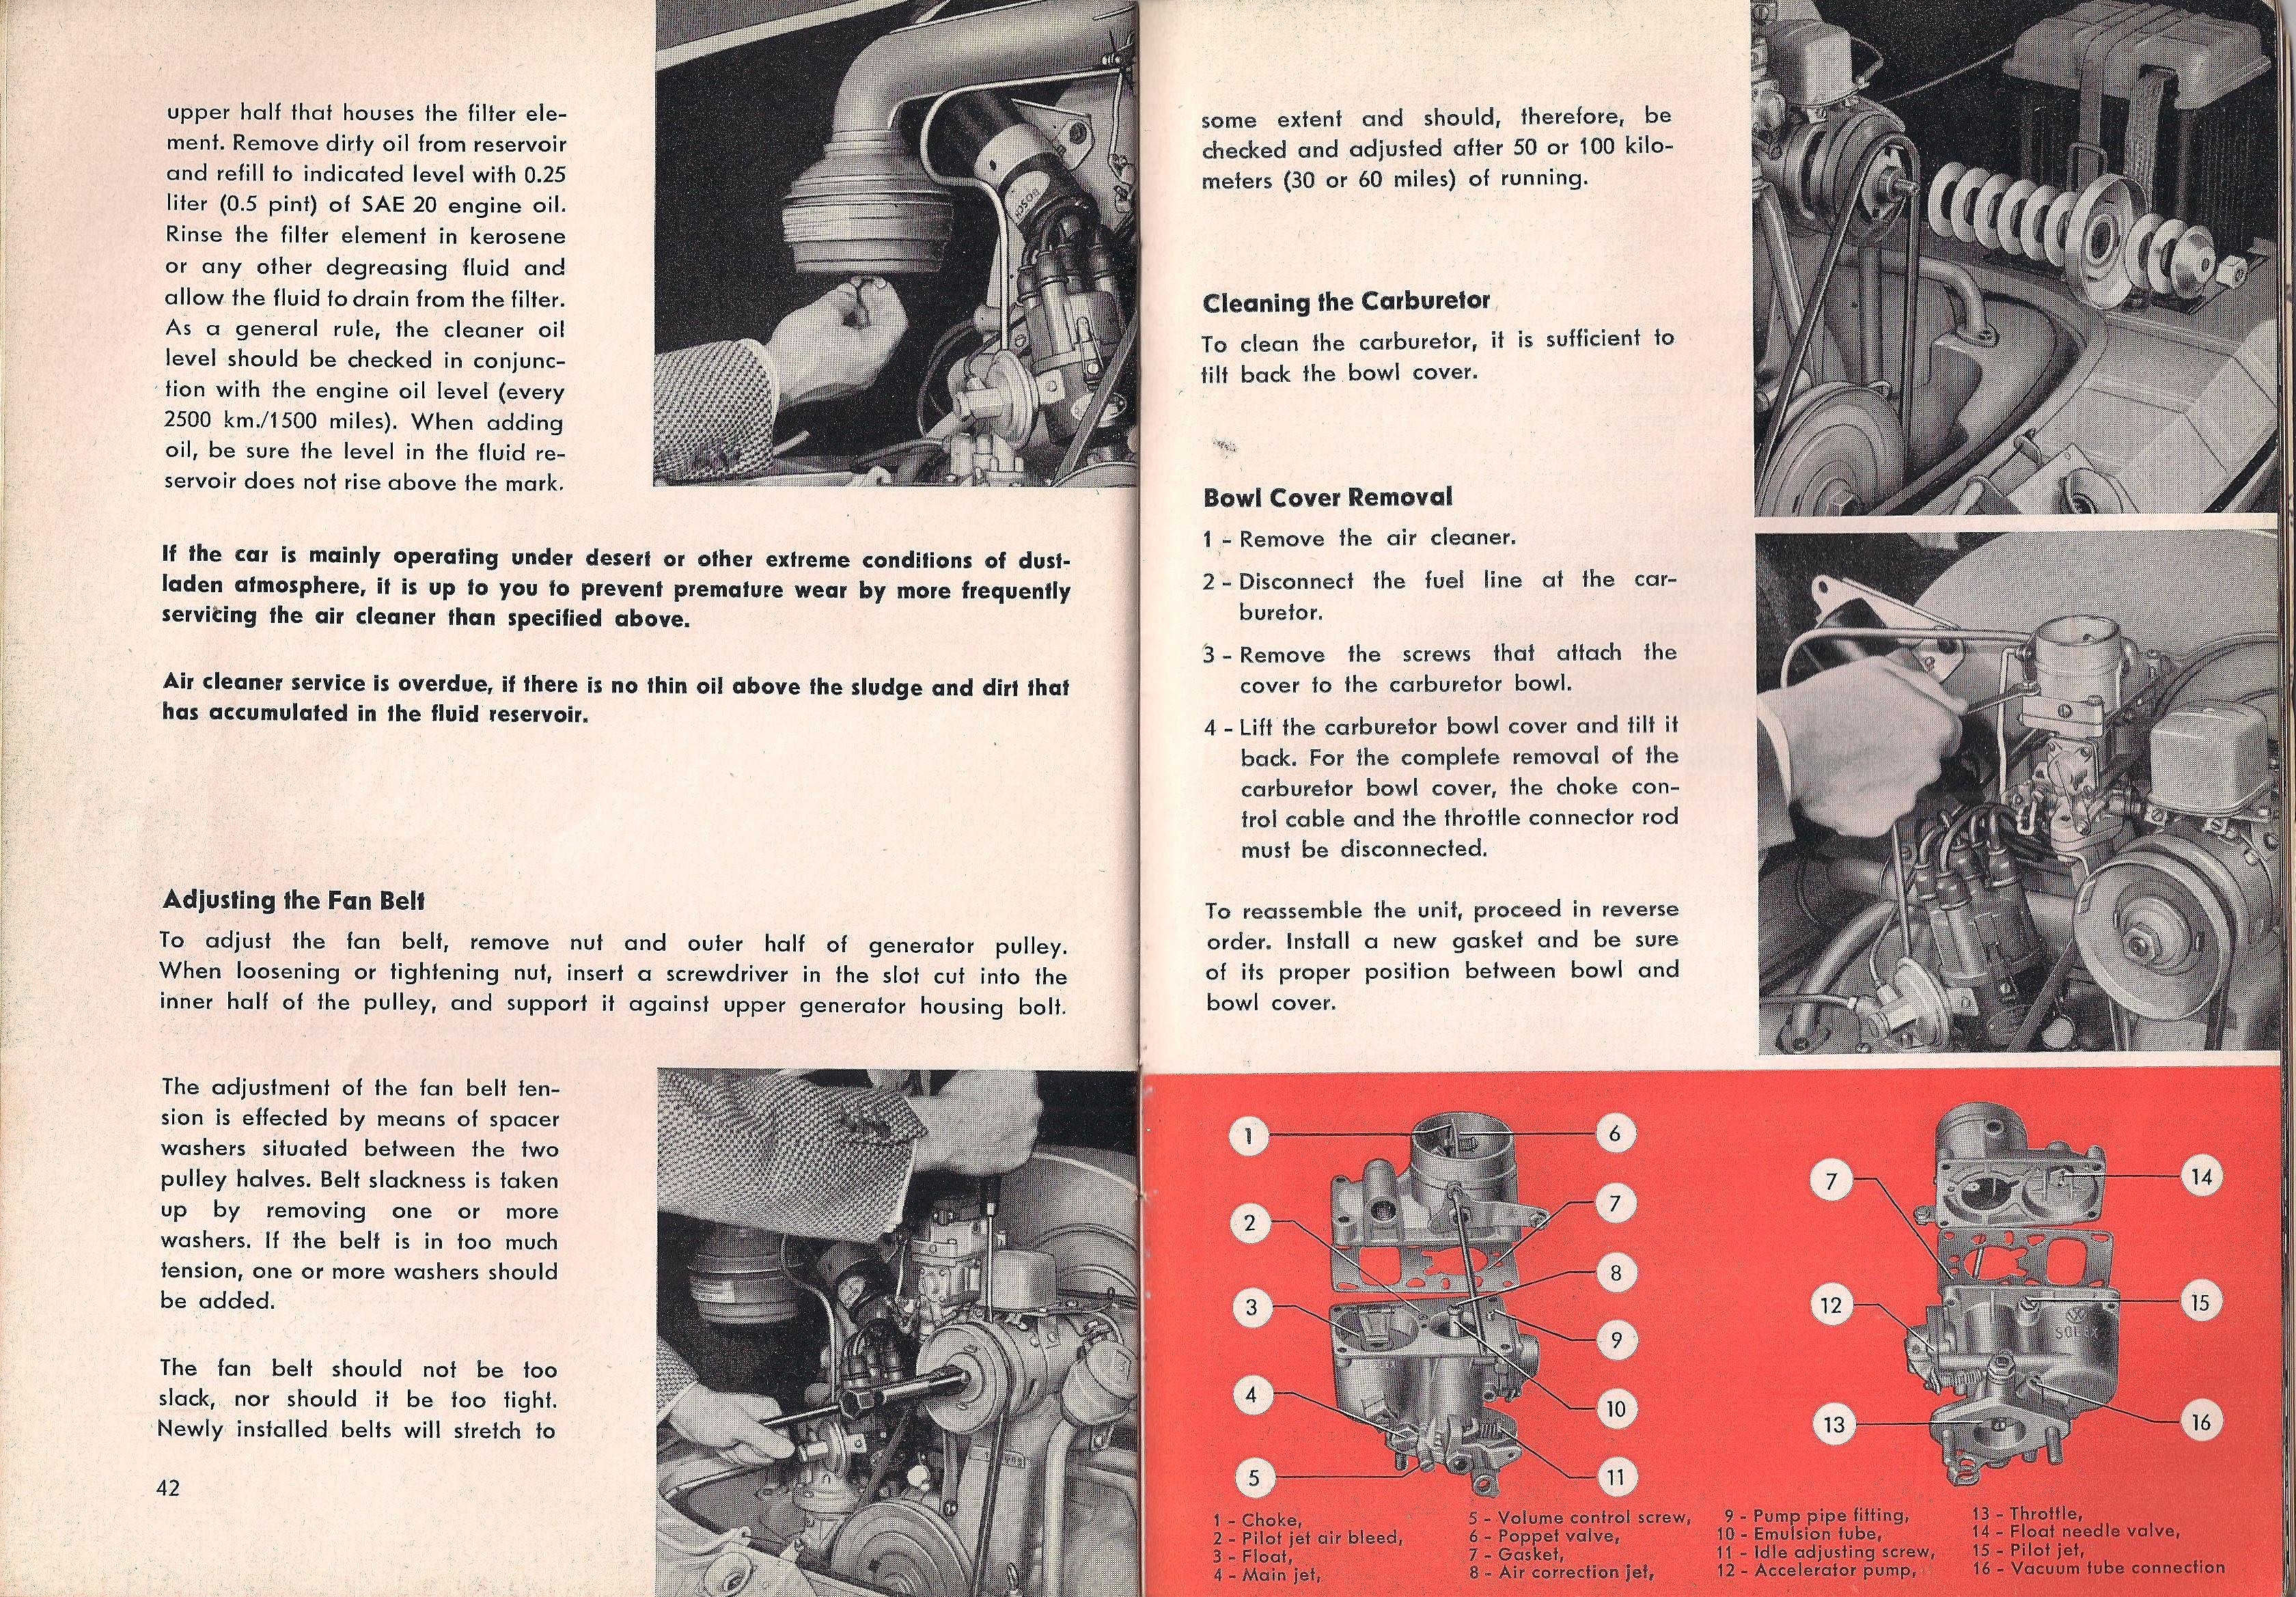 TheSamba com :: January 1957 VW Karmann Ghia Owner's Manual